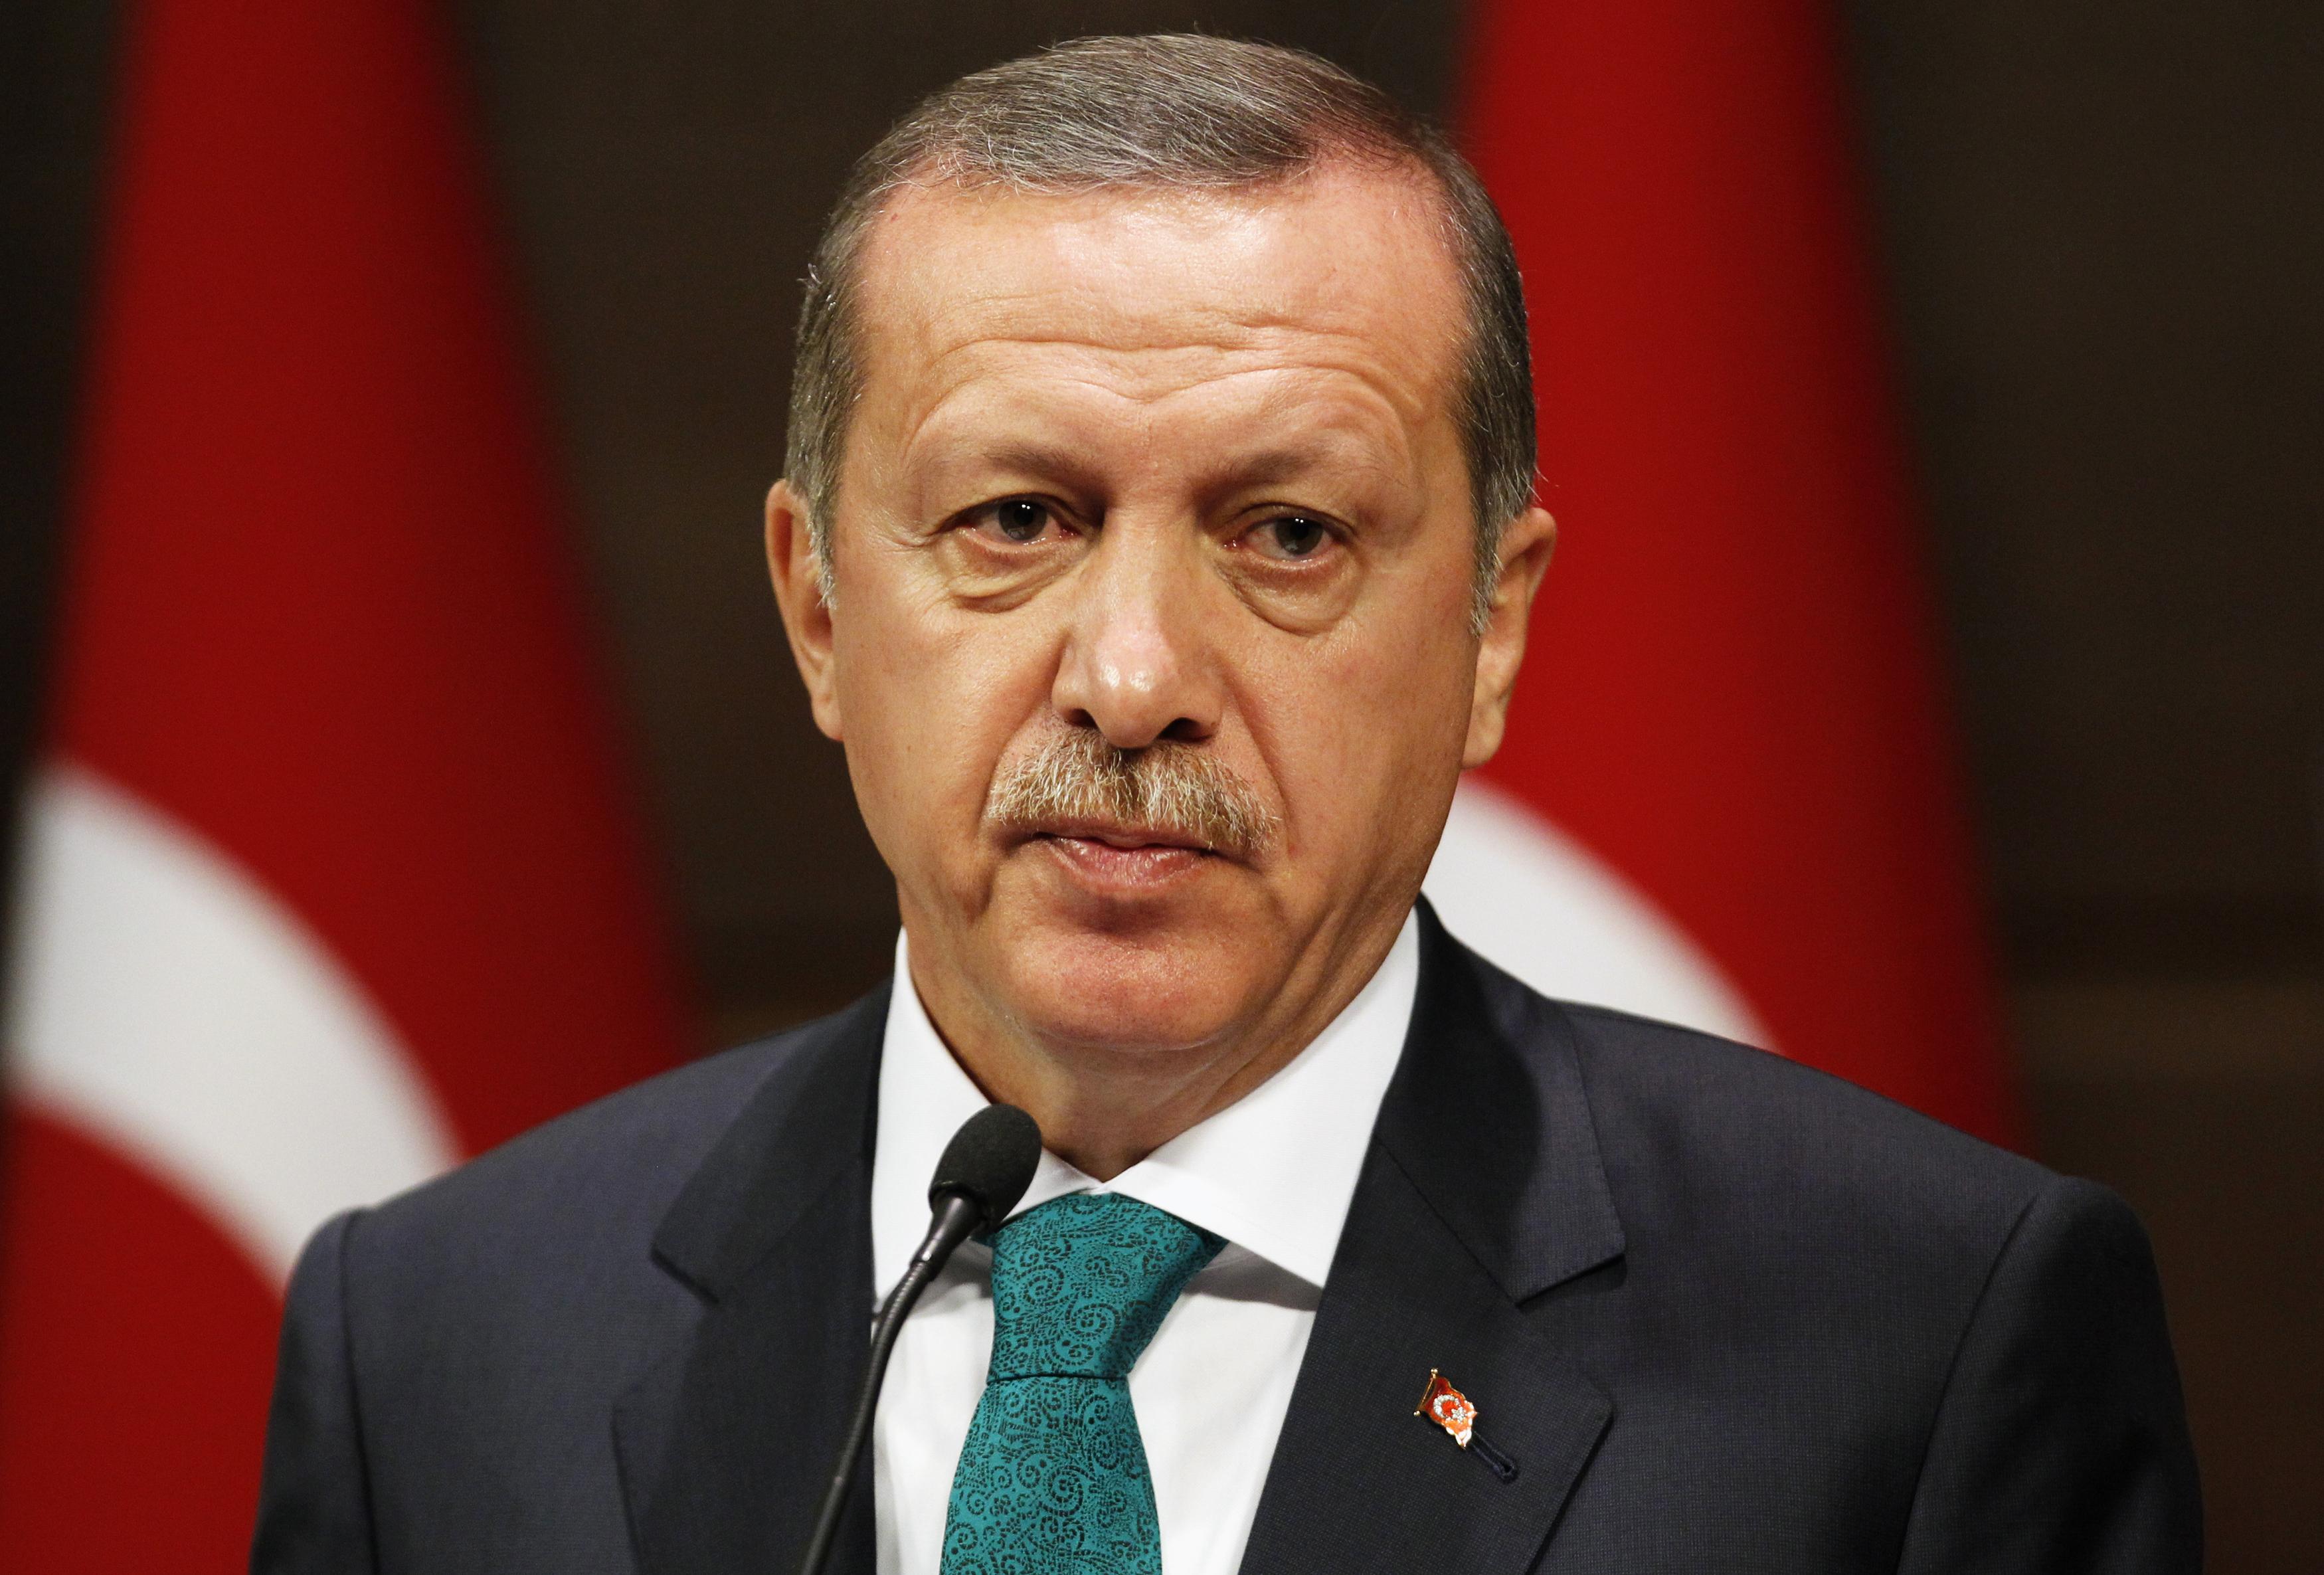 Turkish PM Erdogan addresses the media in Ankara